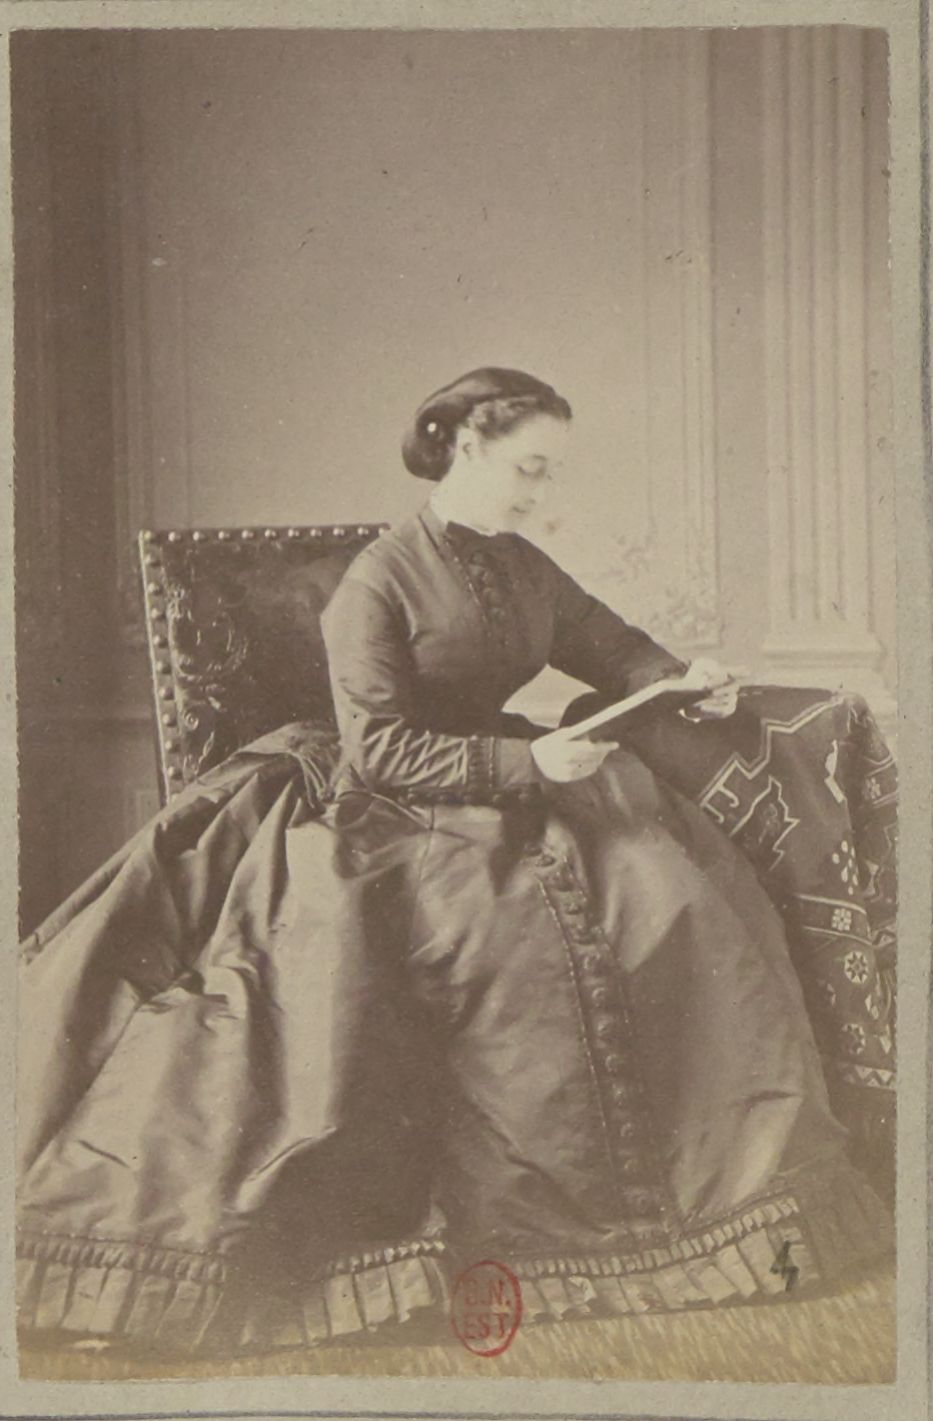 Императрица Евге́ния (5 мая 1826 — 11 июля 1920) — последняя императрица Франции, супруга Наполеона III